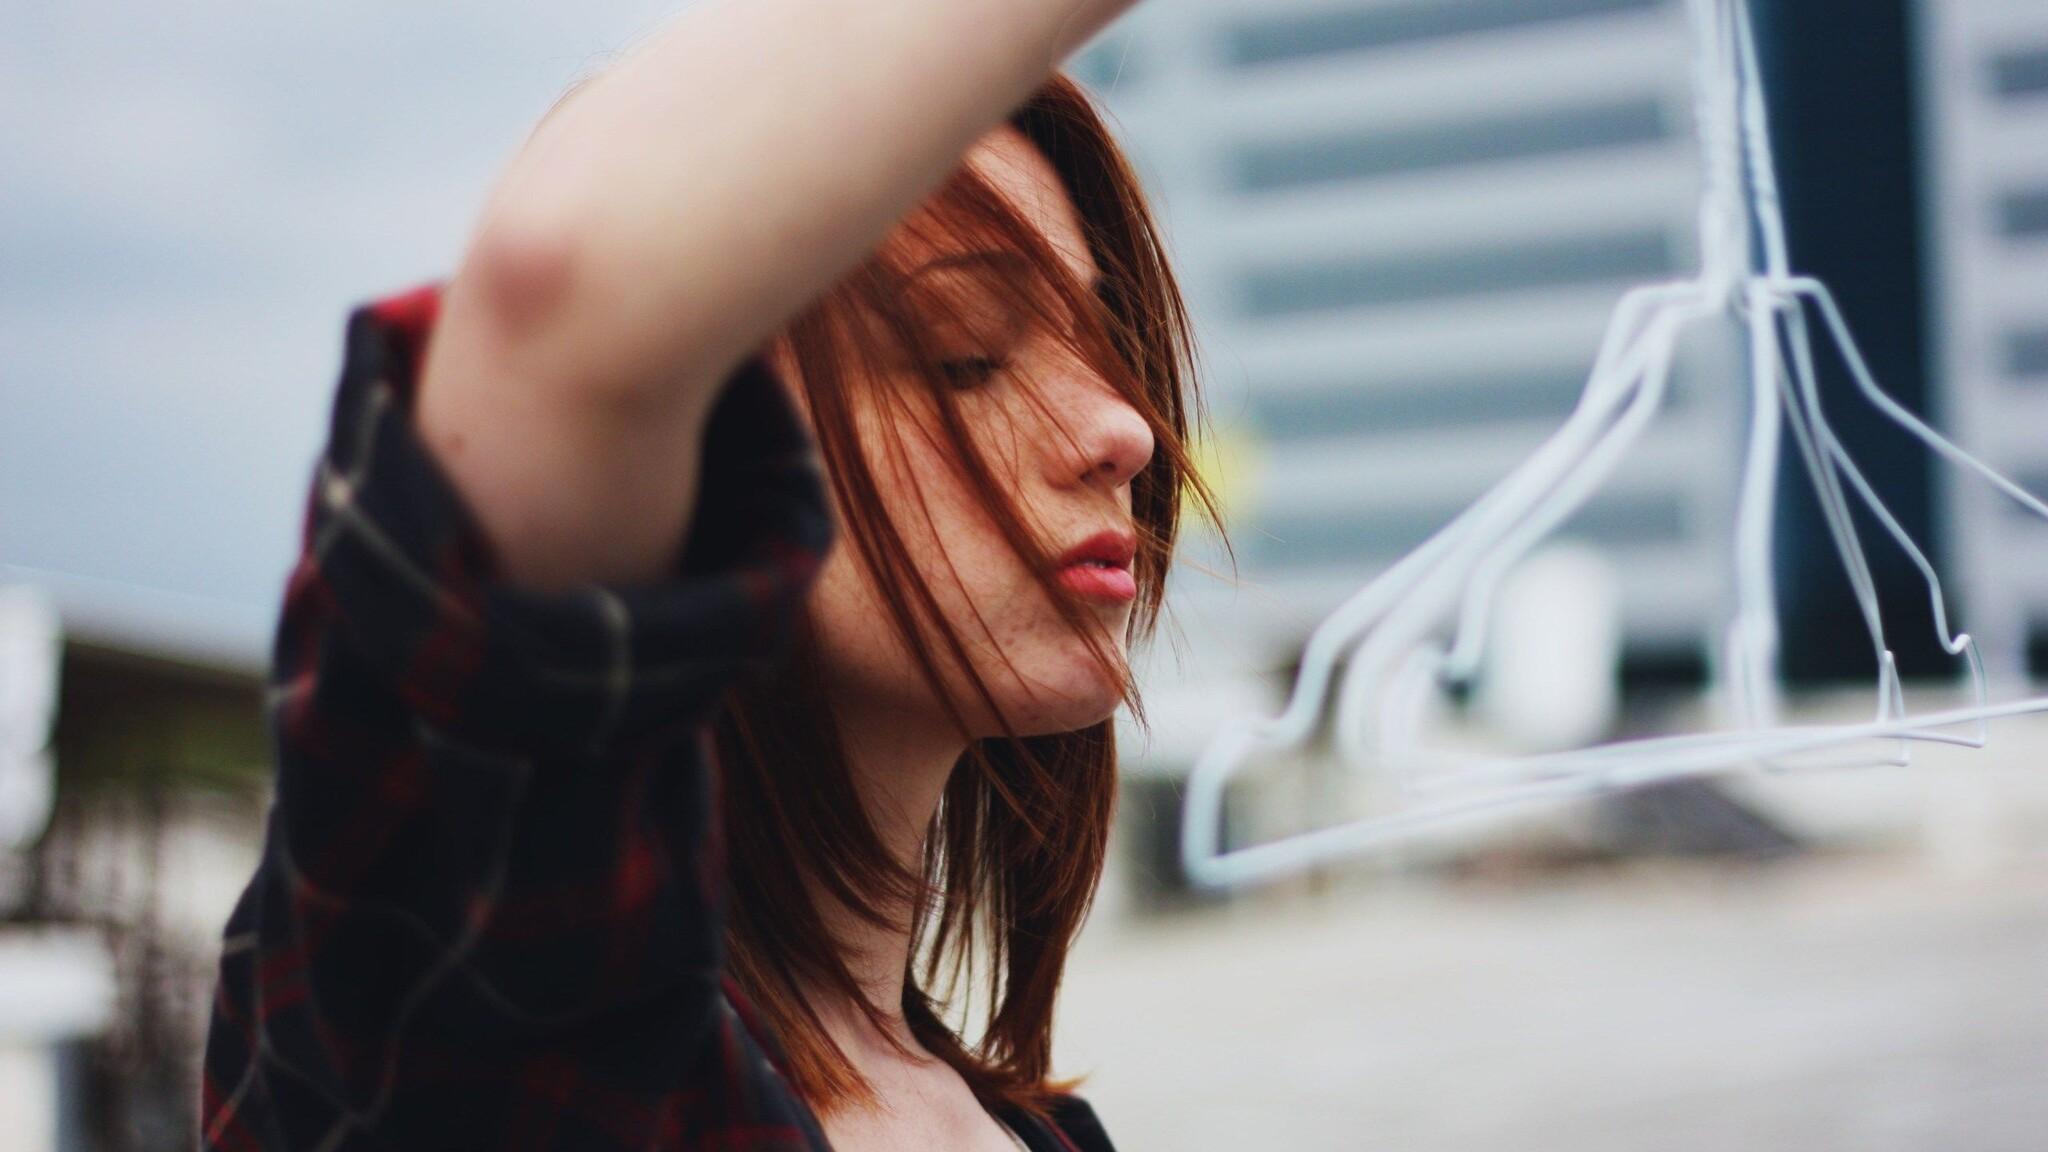 women-outdoors-closed-eyes-6t.jpg